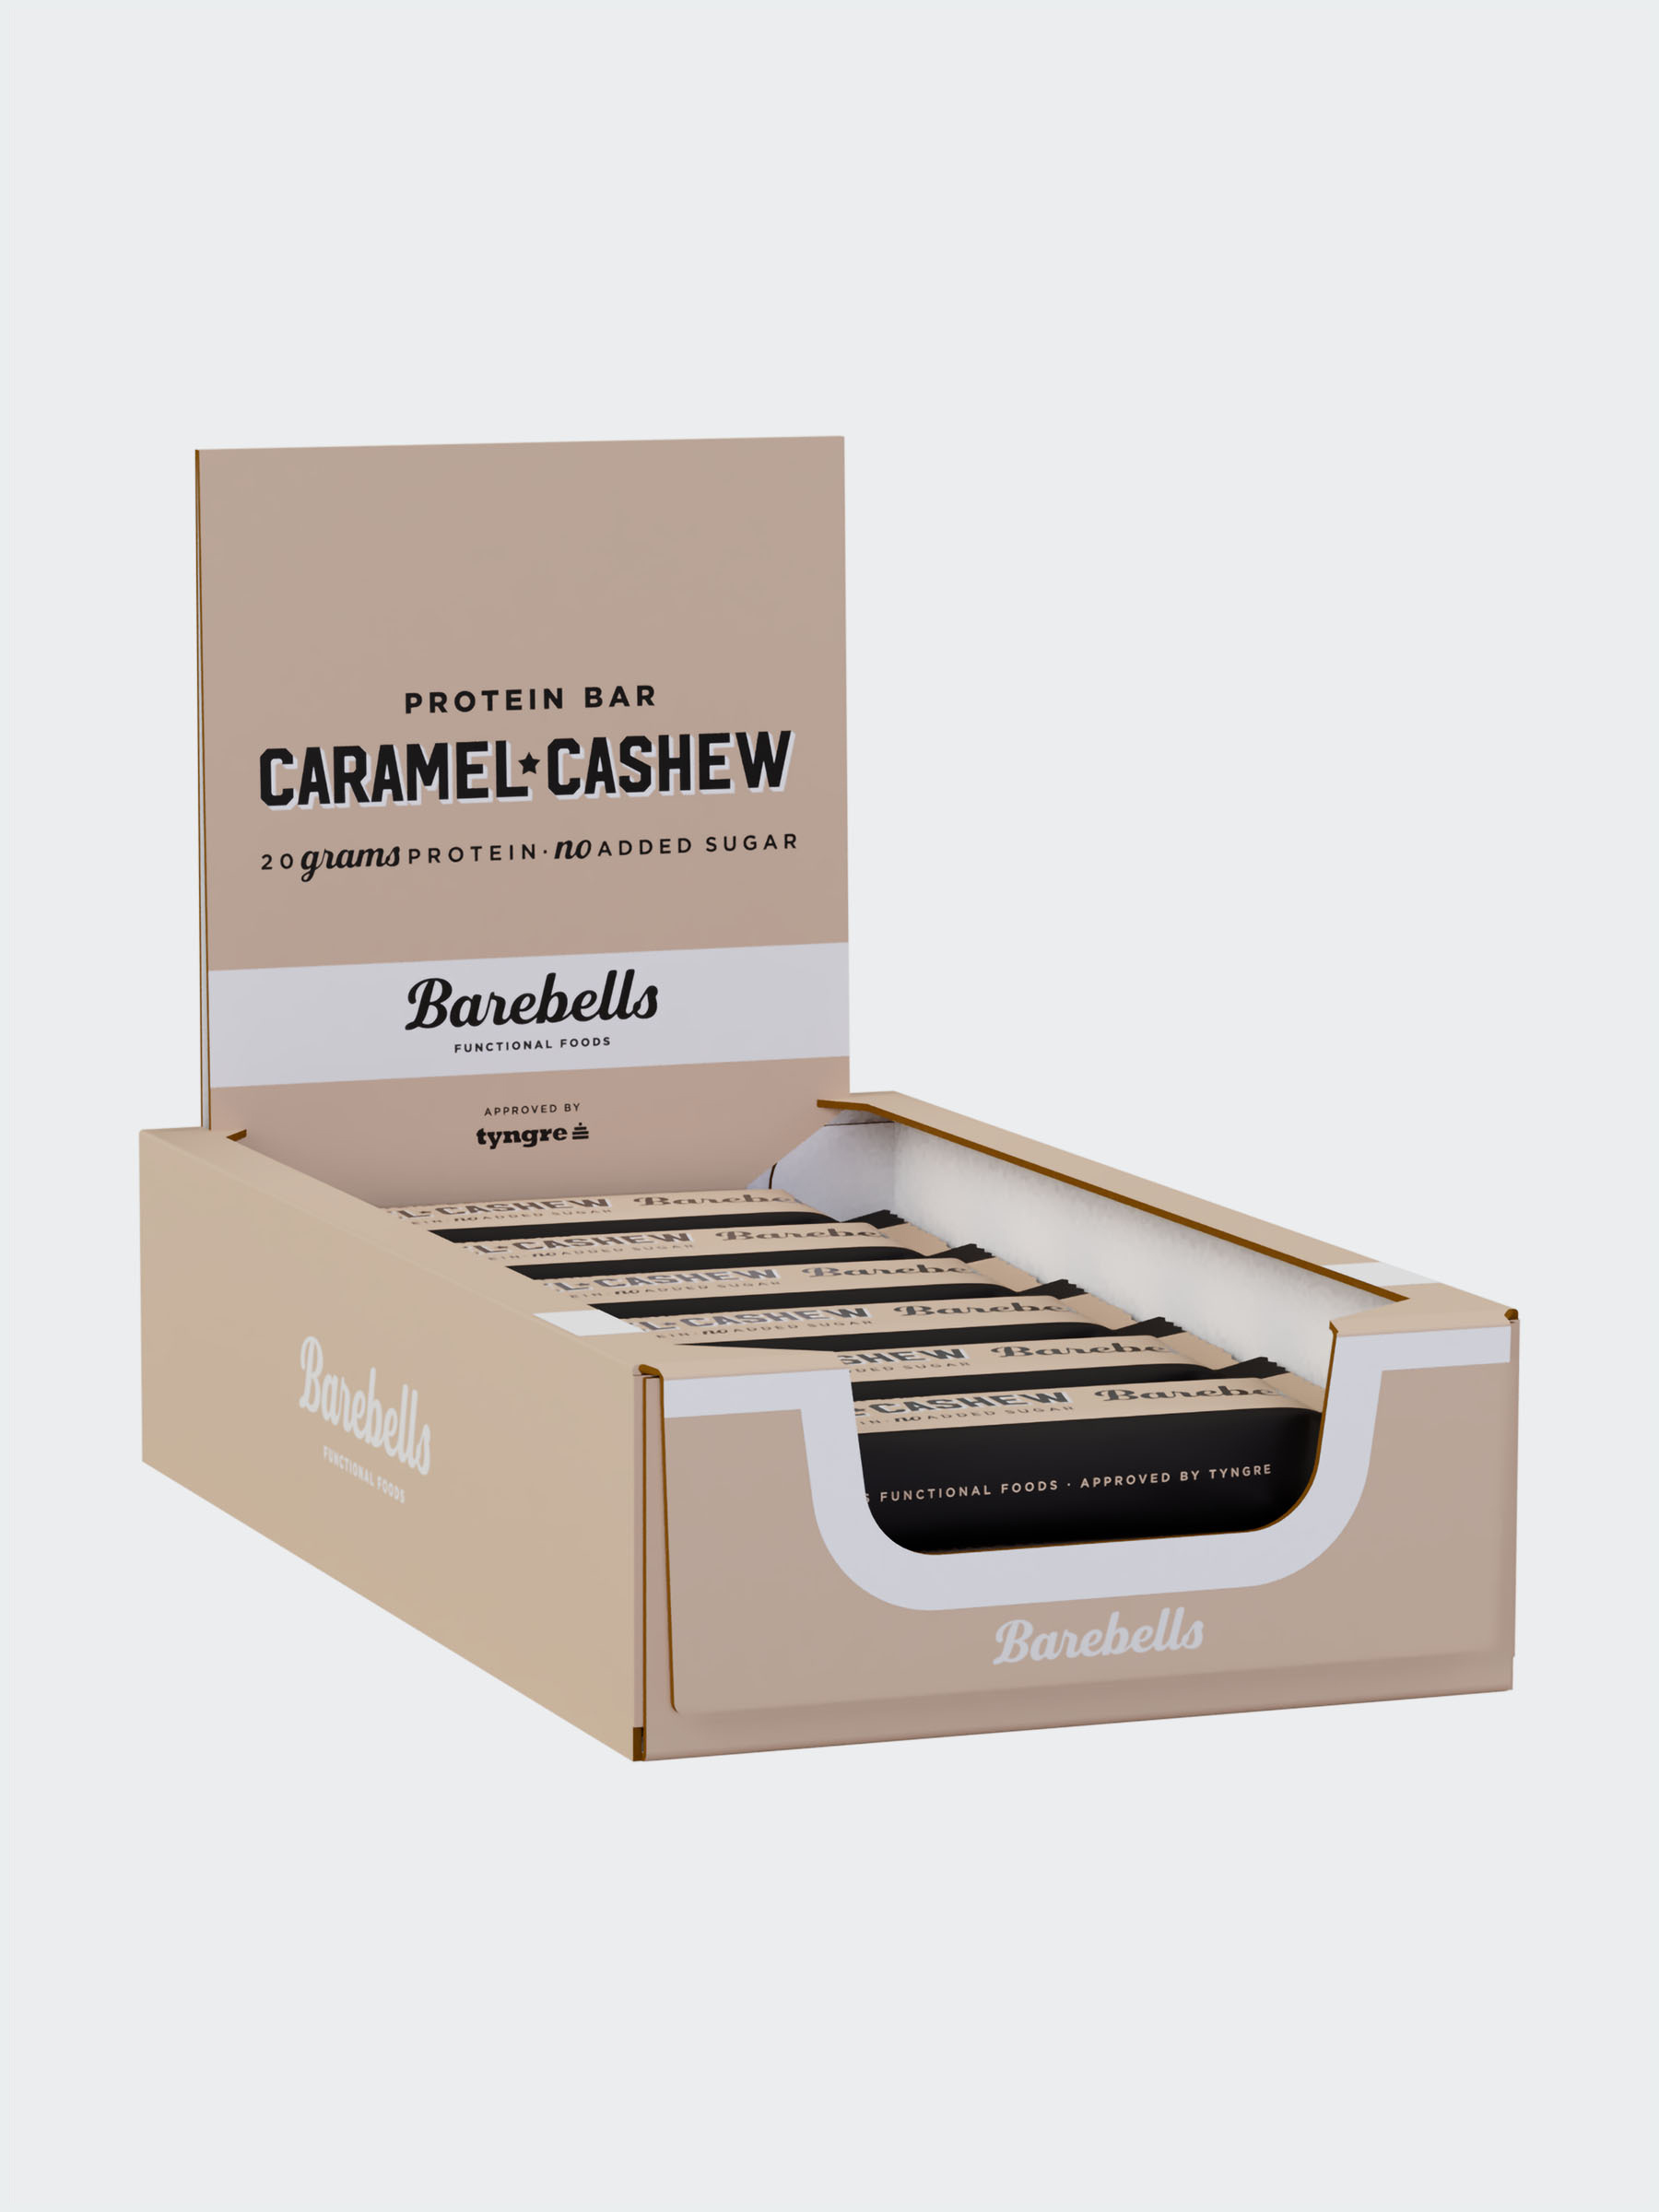 Barebells Caramel-Cashew 12-pack